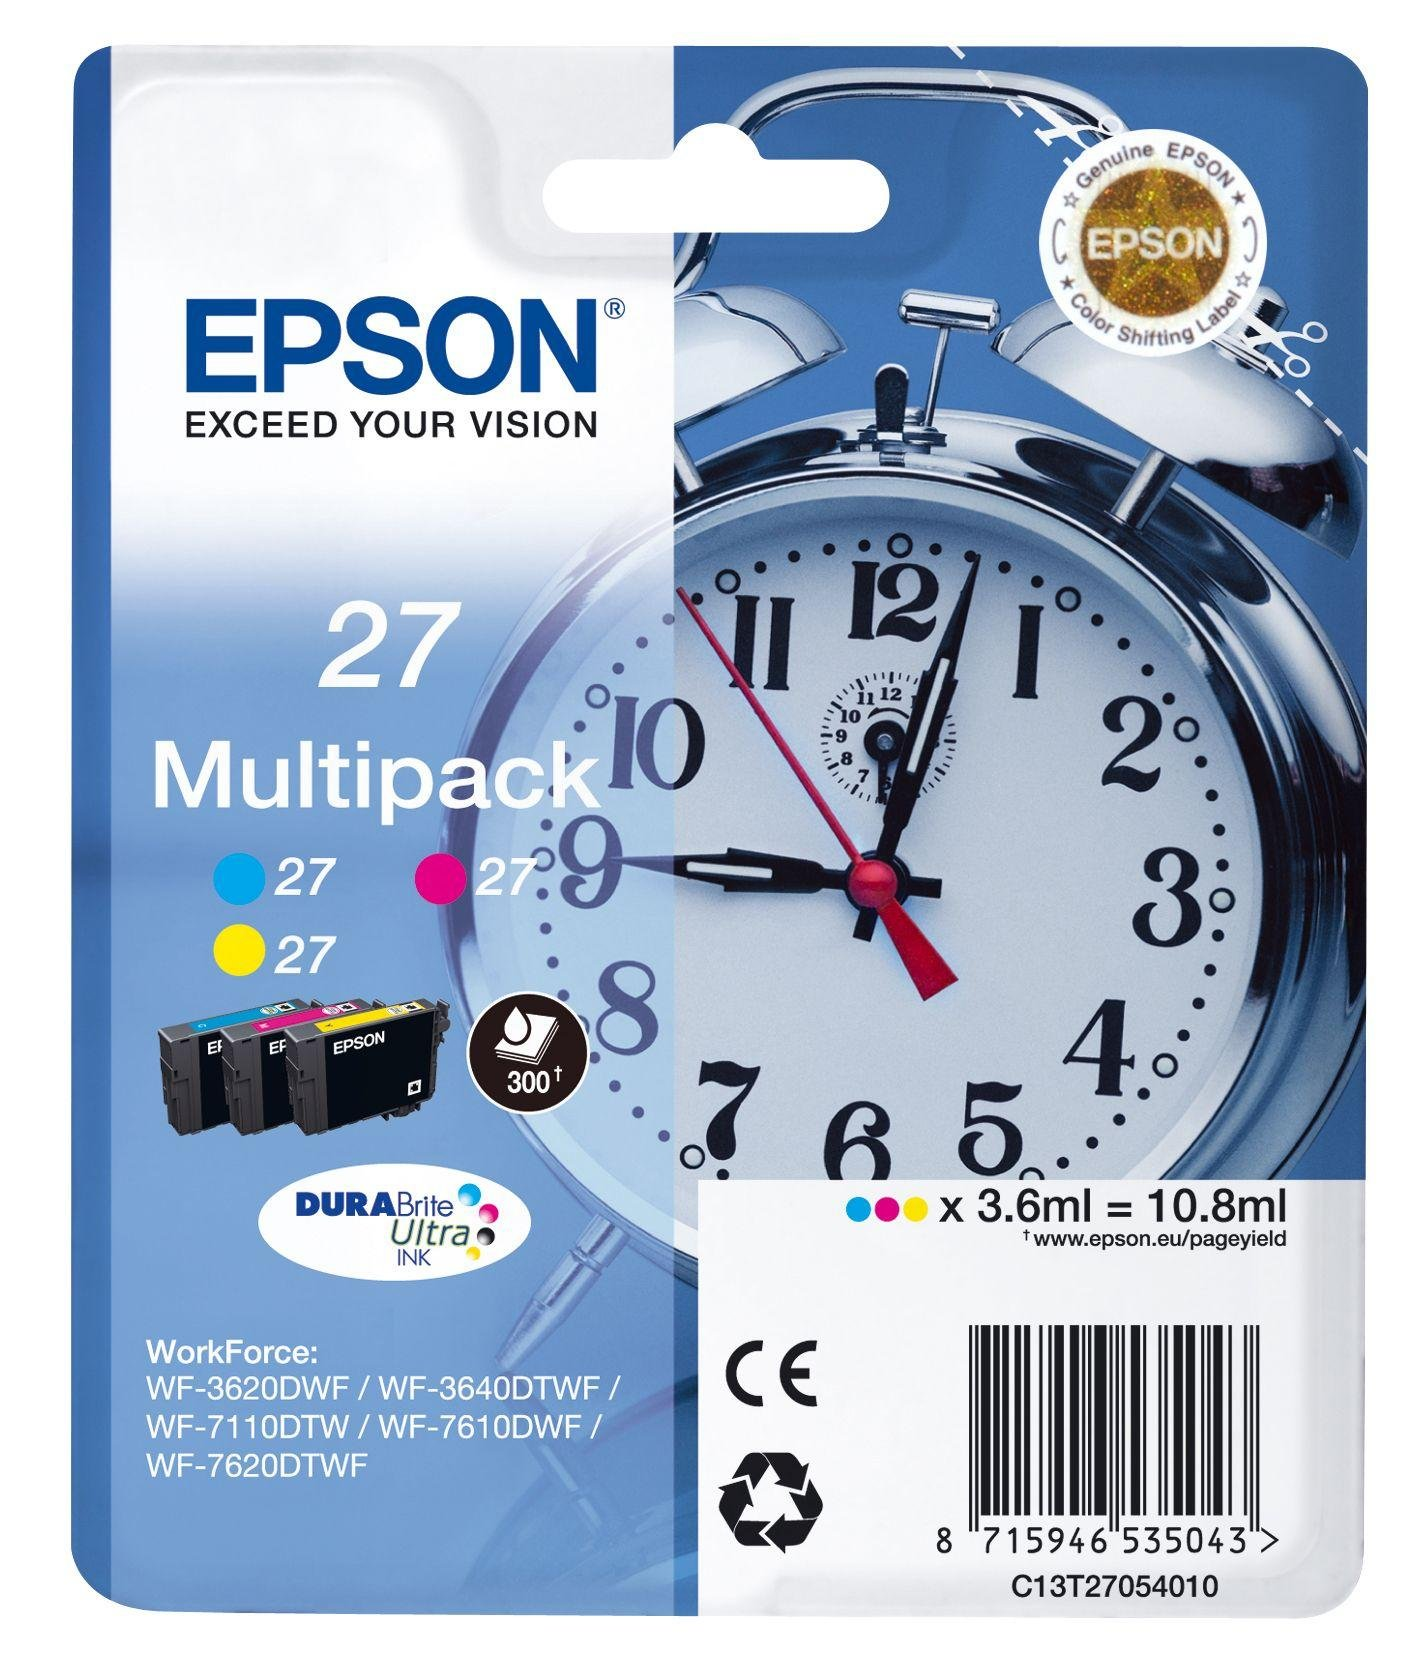 Image of Epson Alarm Clock 27 STD C/M/Y Multipack Ink Cartridge